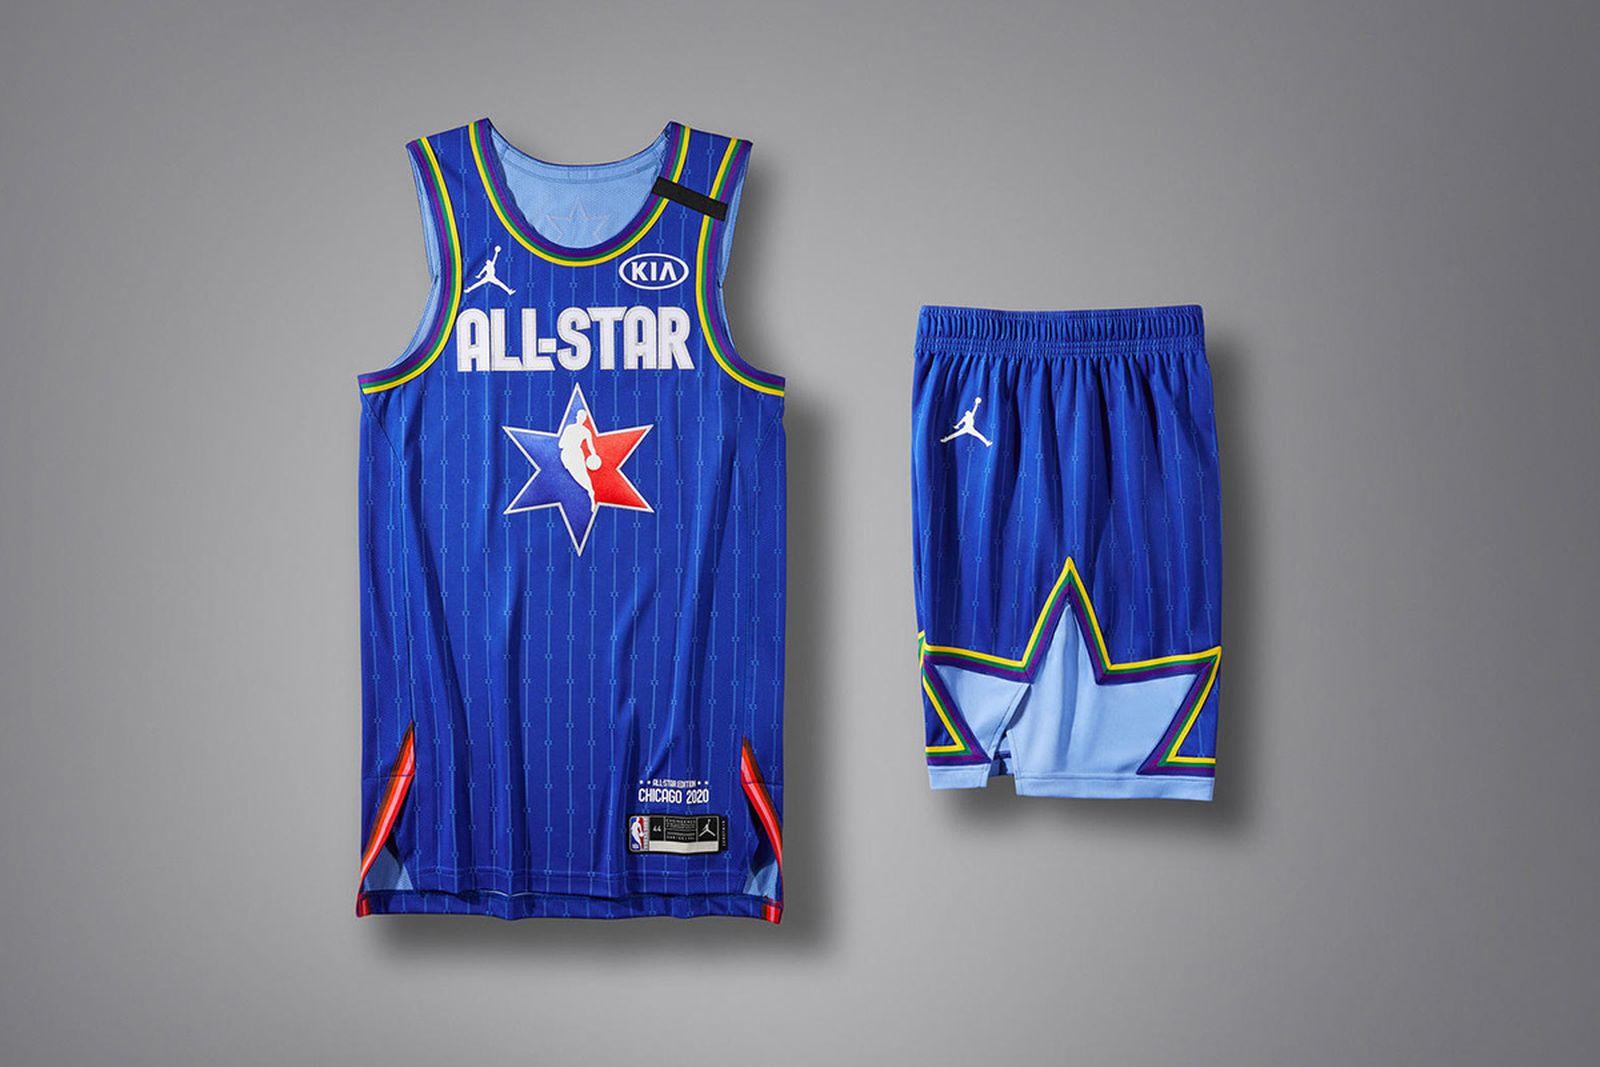 jordan-brand-nba-star-game-uniforms-01